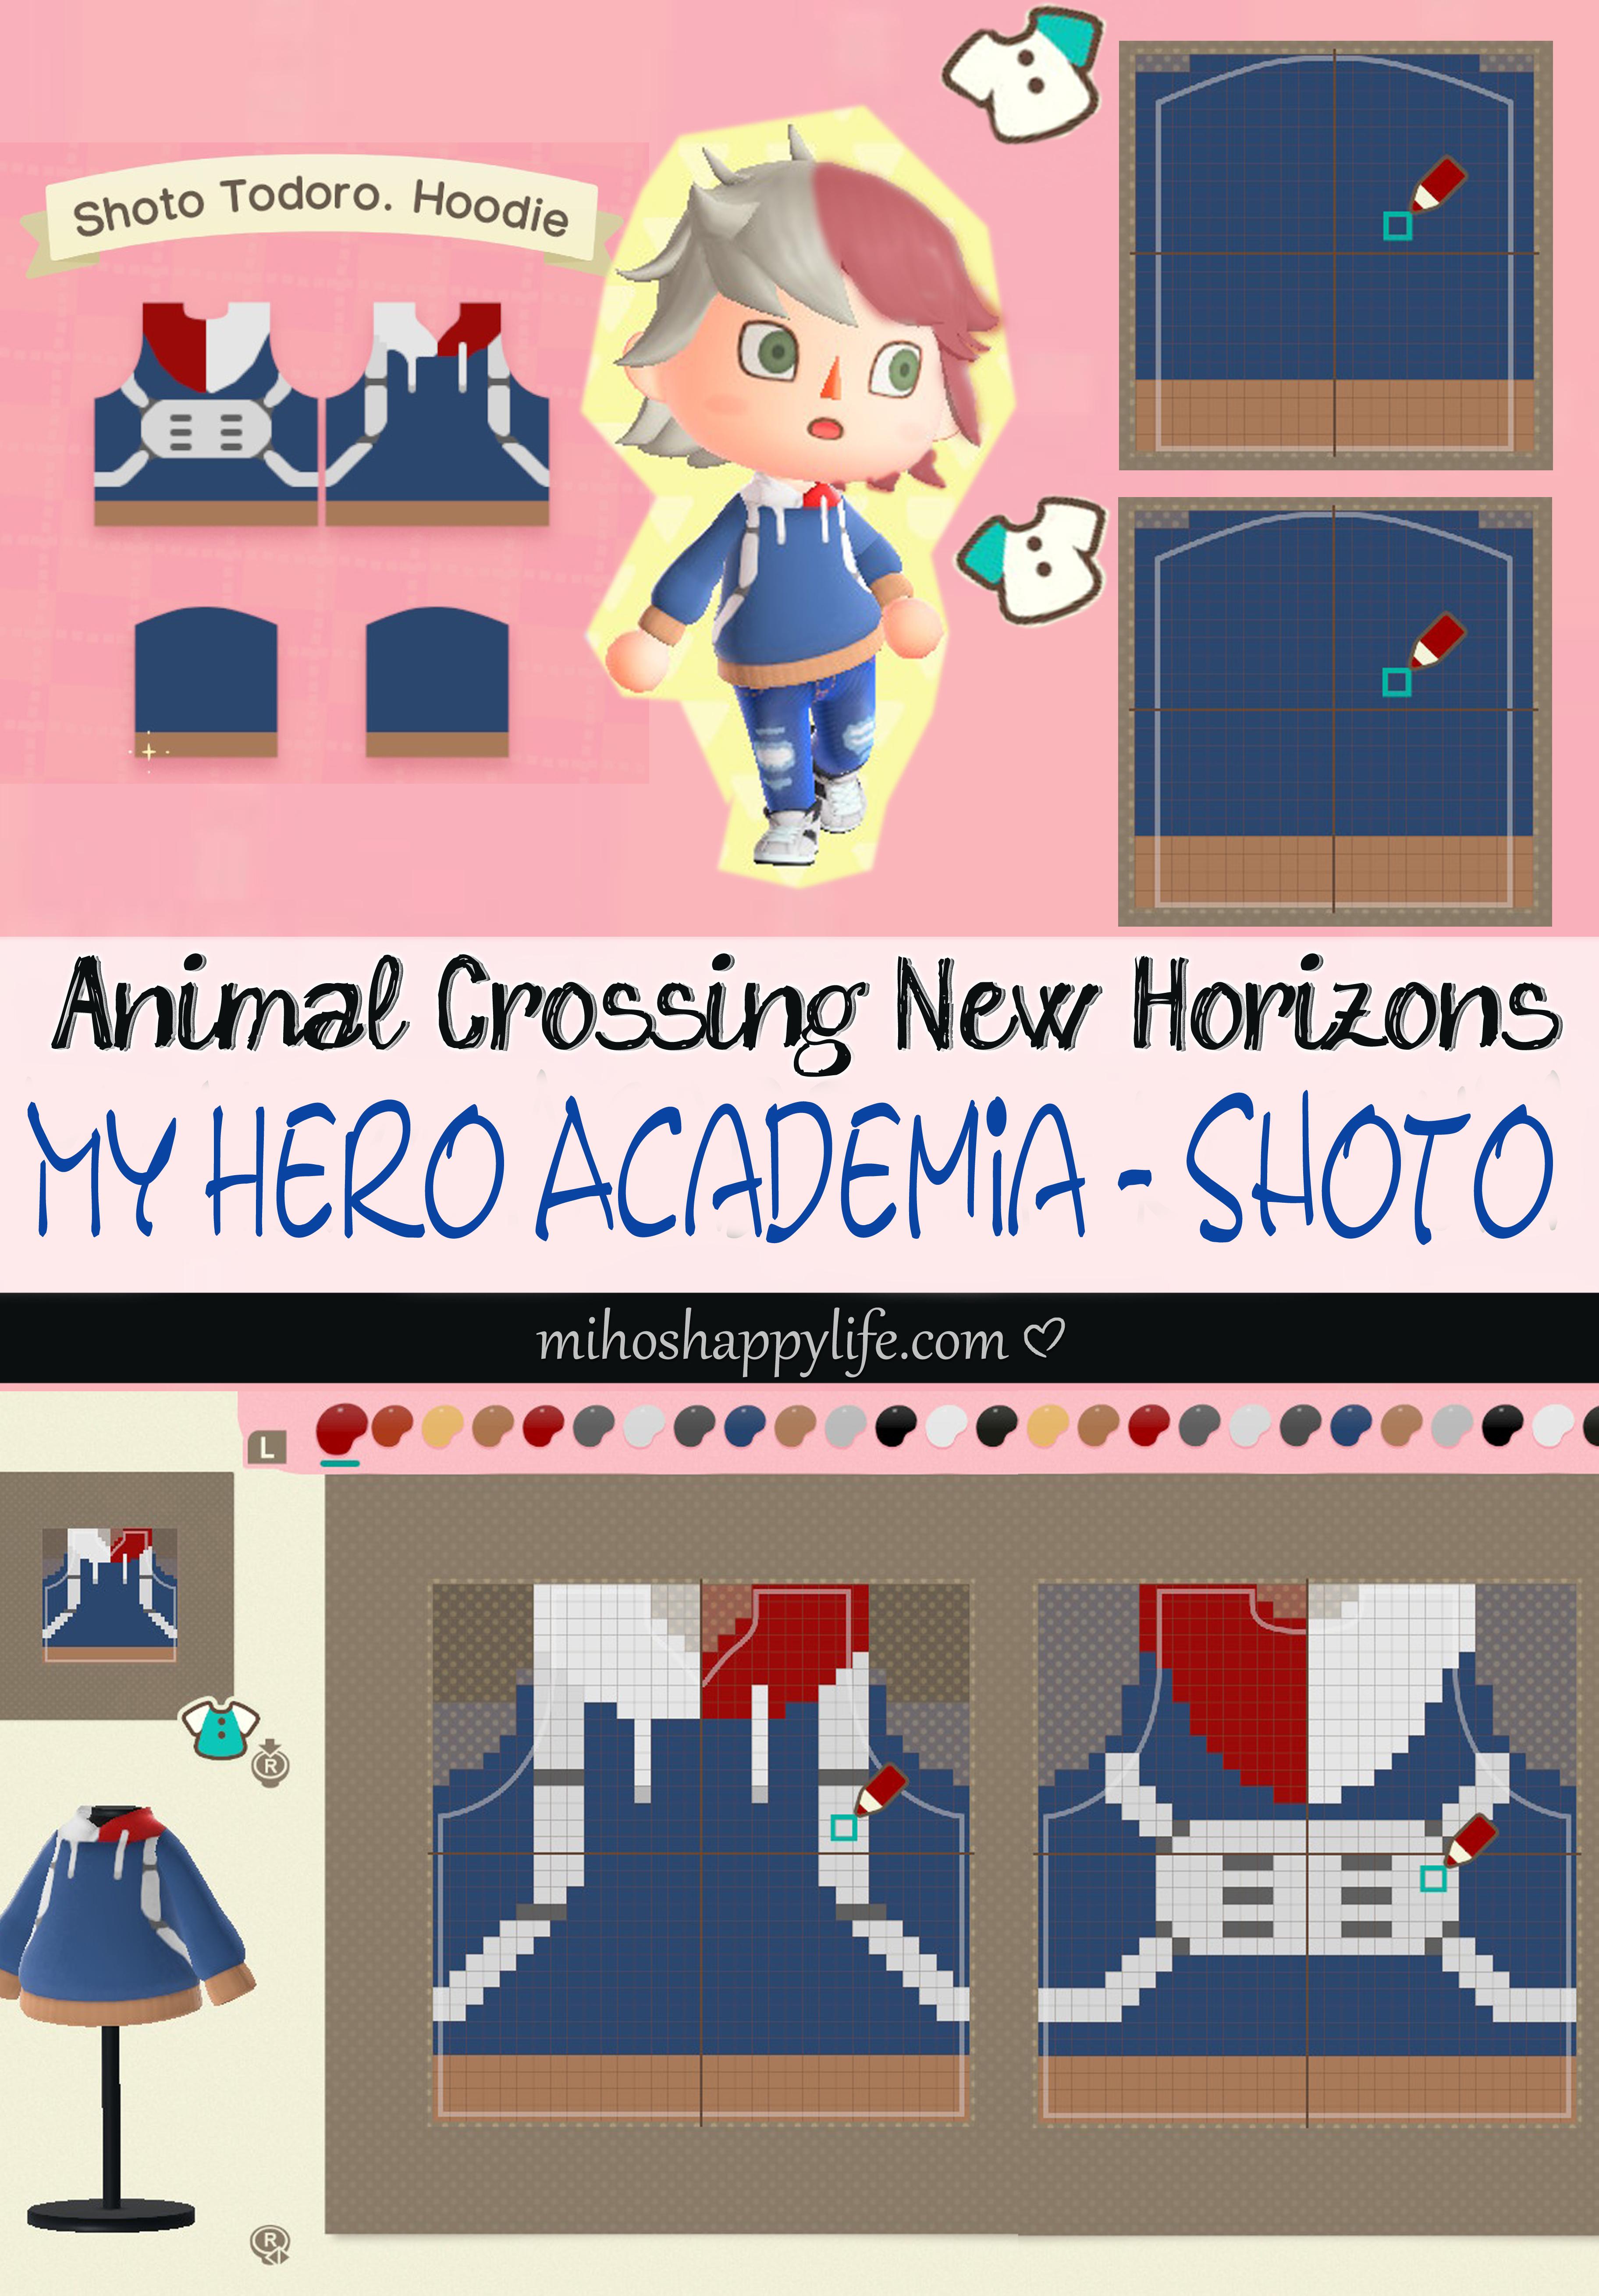 mihoshappylife-animal-crossing-my-hero-academia-shoto